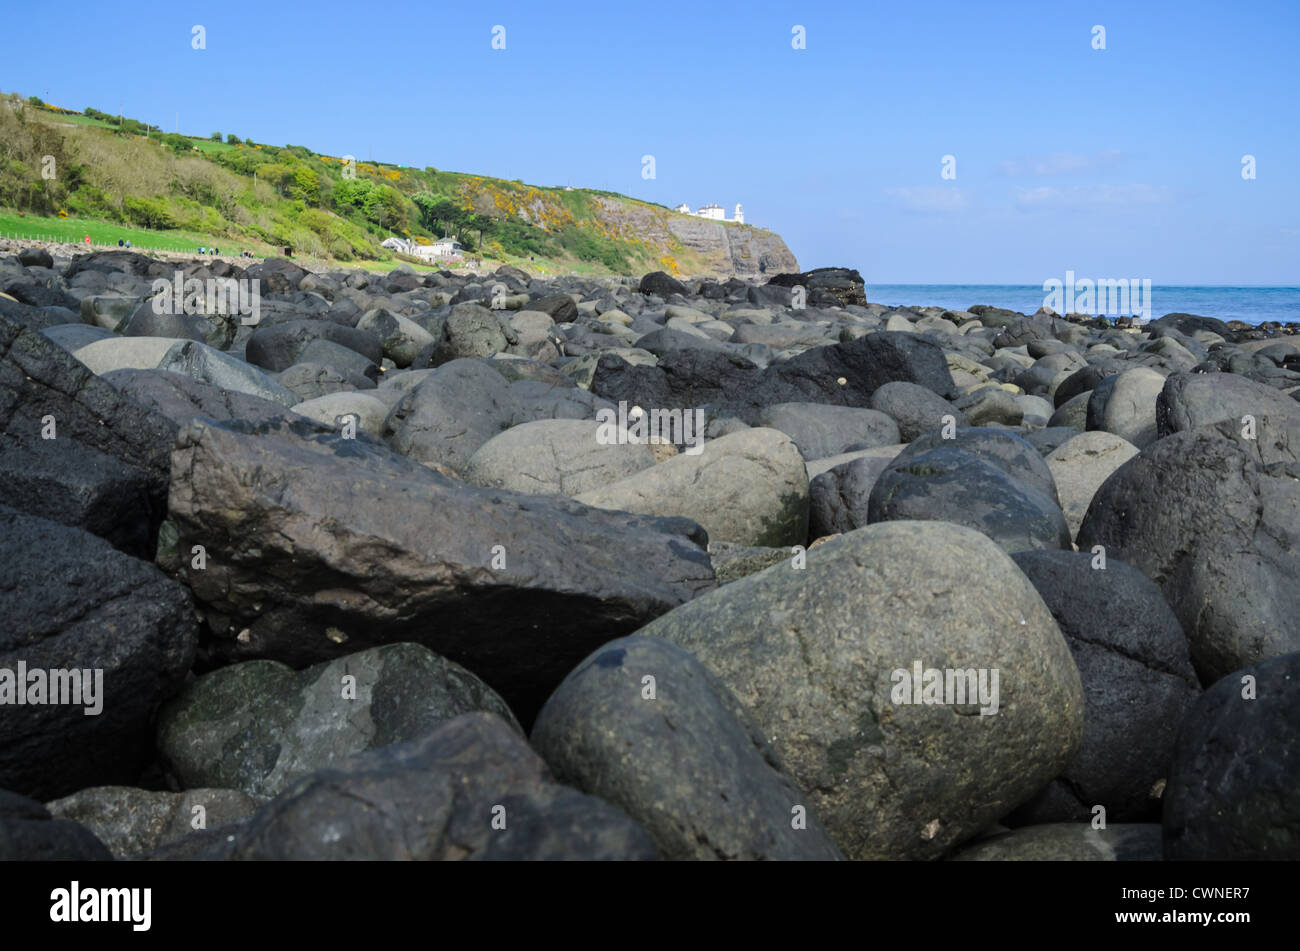 Beach along Blackhead path, County Antrim, Northern Ireland - Stock Image